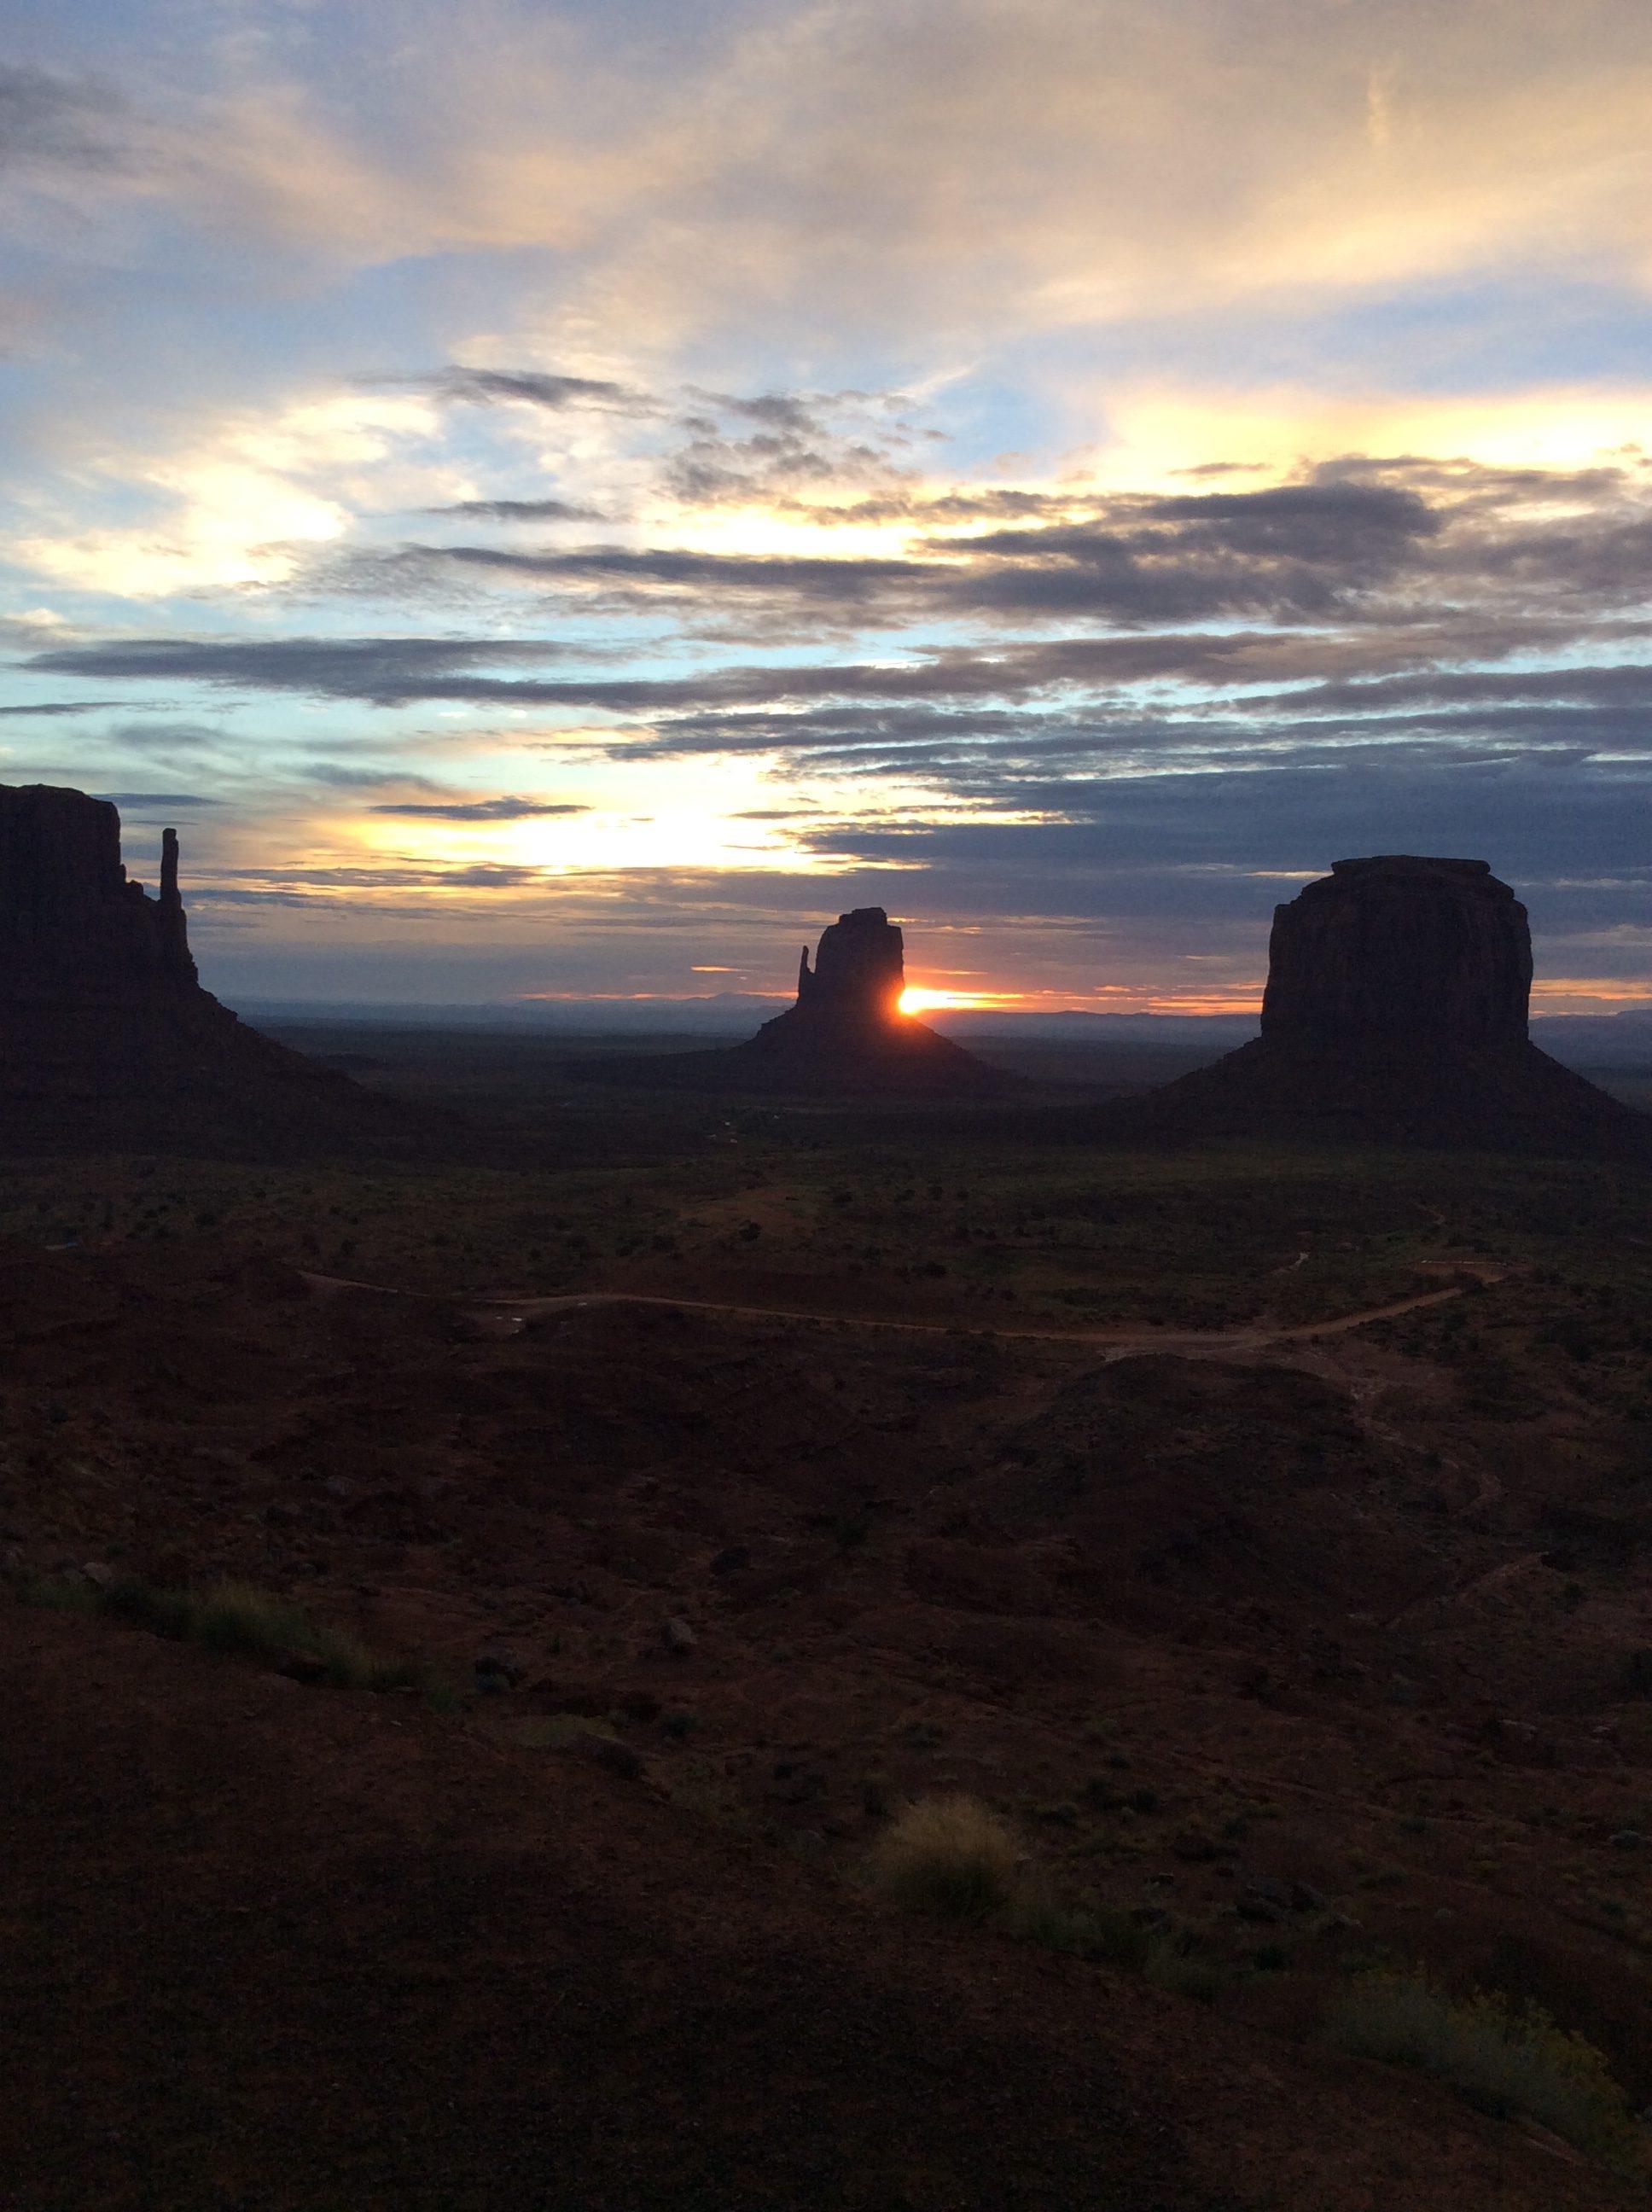 Monument Valley Navajo